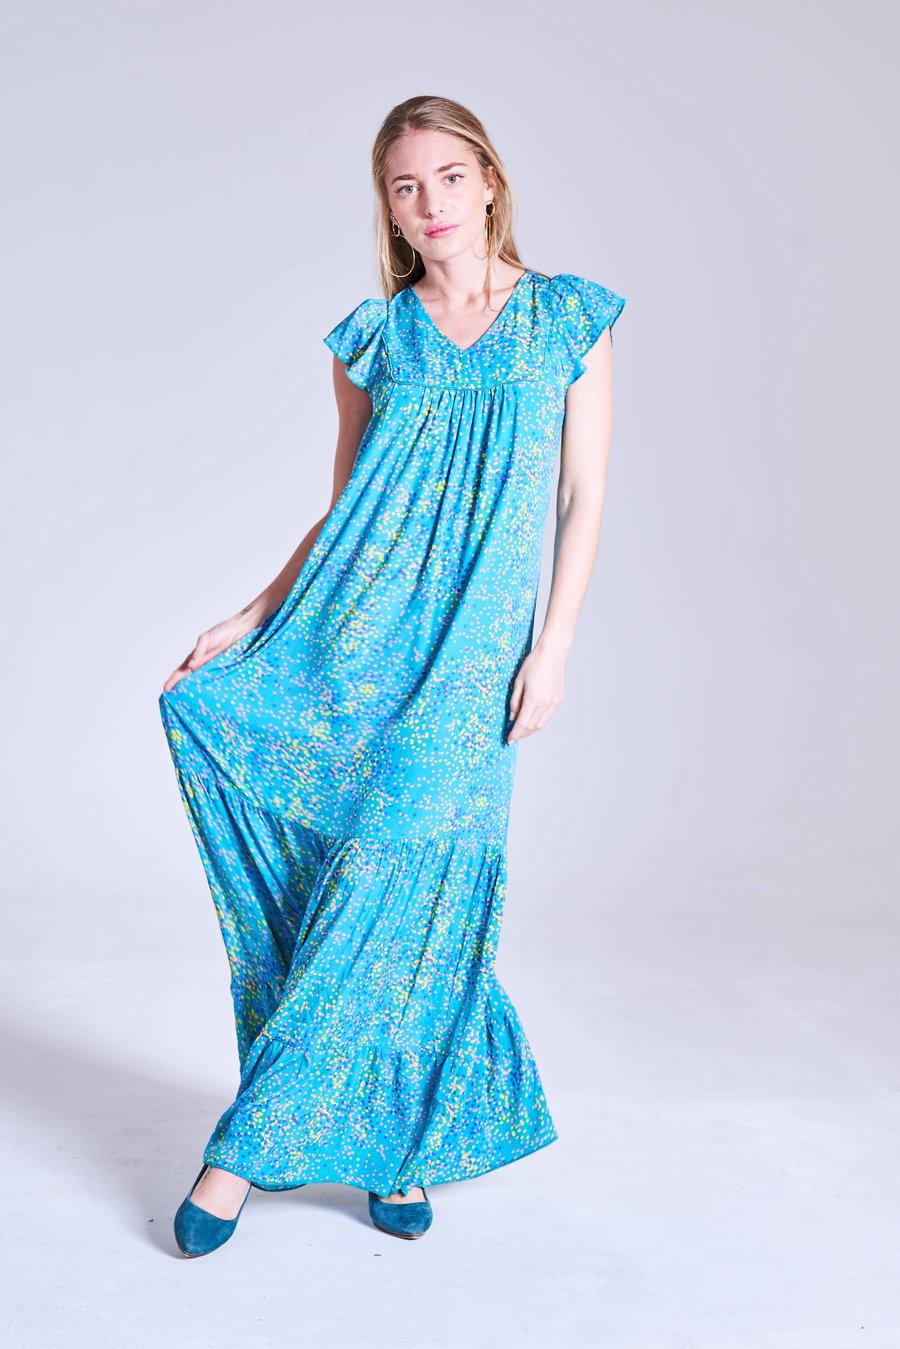 Image of Vestido Mujeres Turquesa